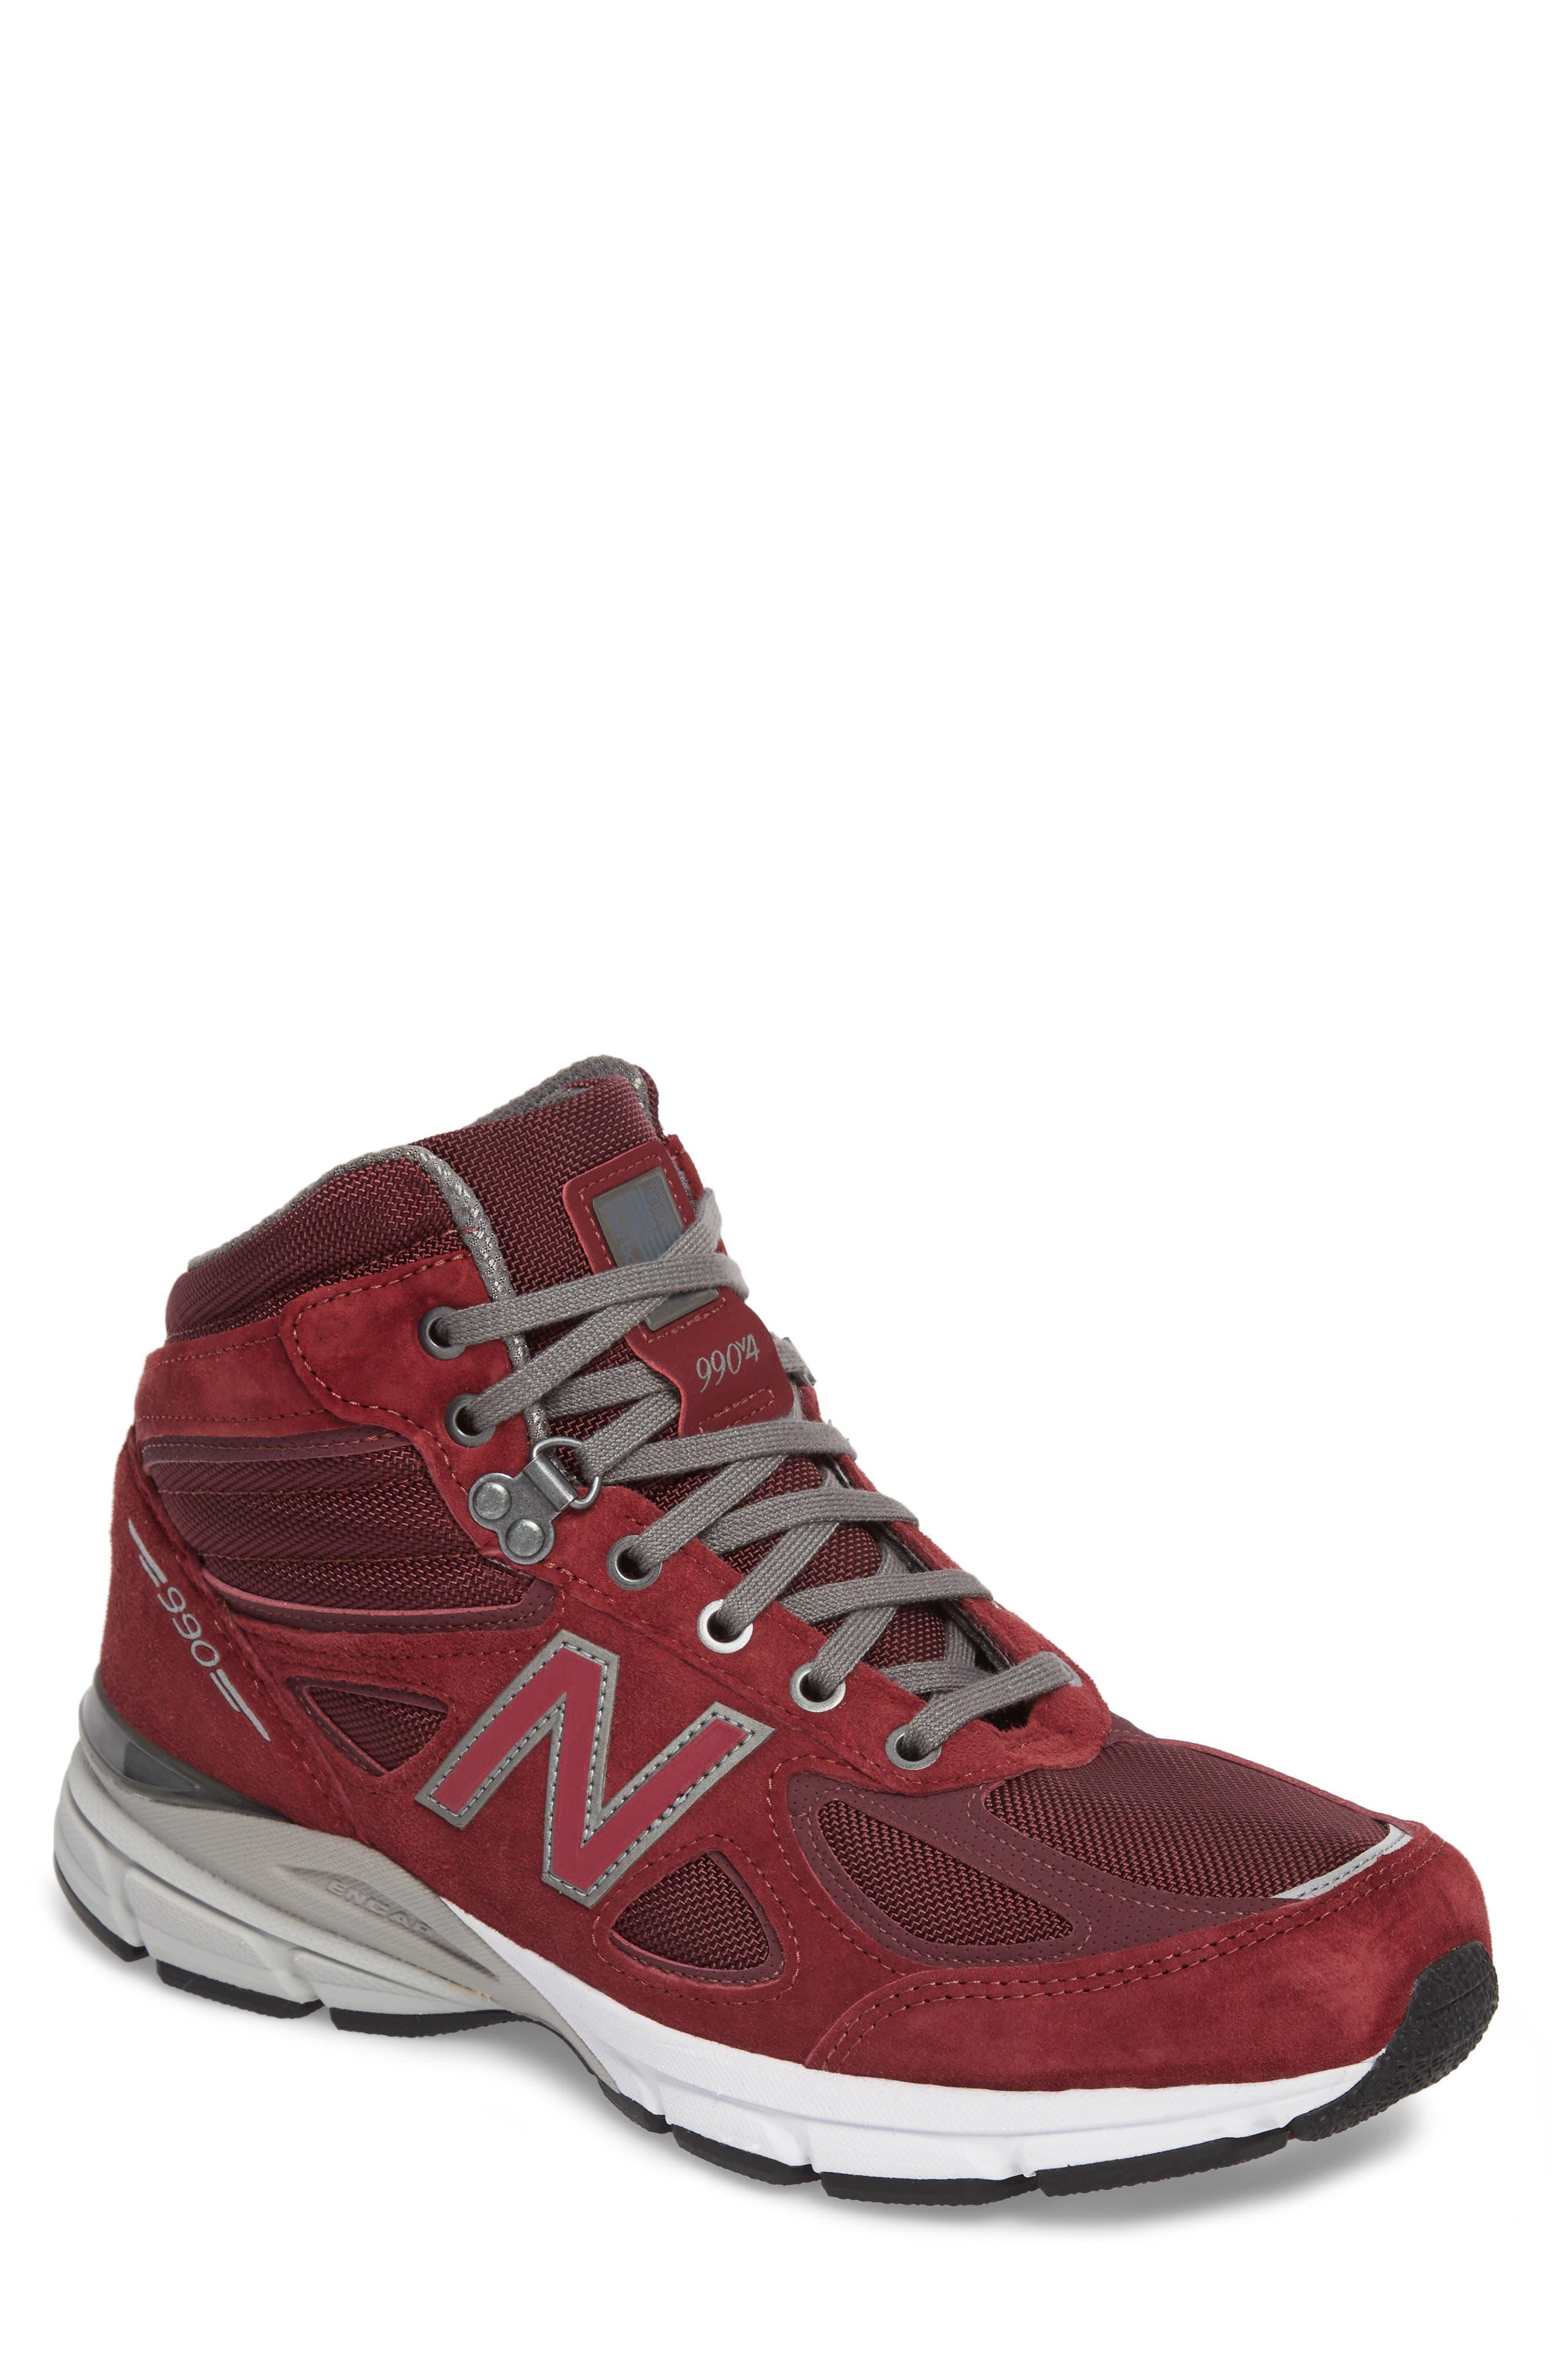 990v4 Water Resistant Sneaker Boot,                         Main,                         color, 932